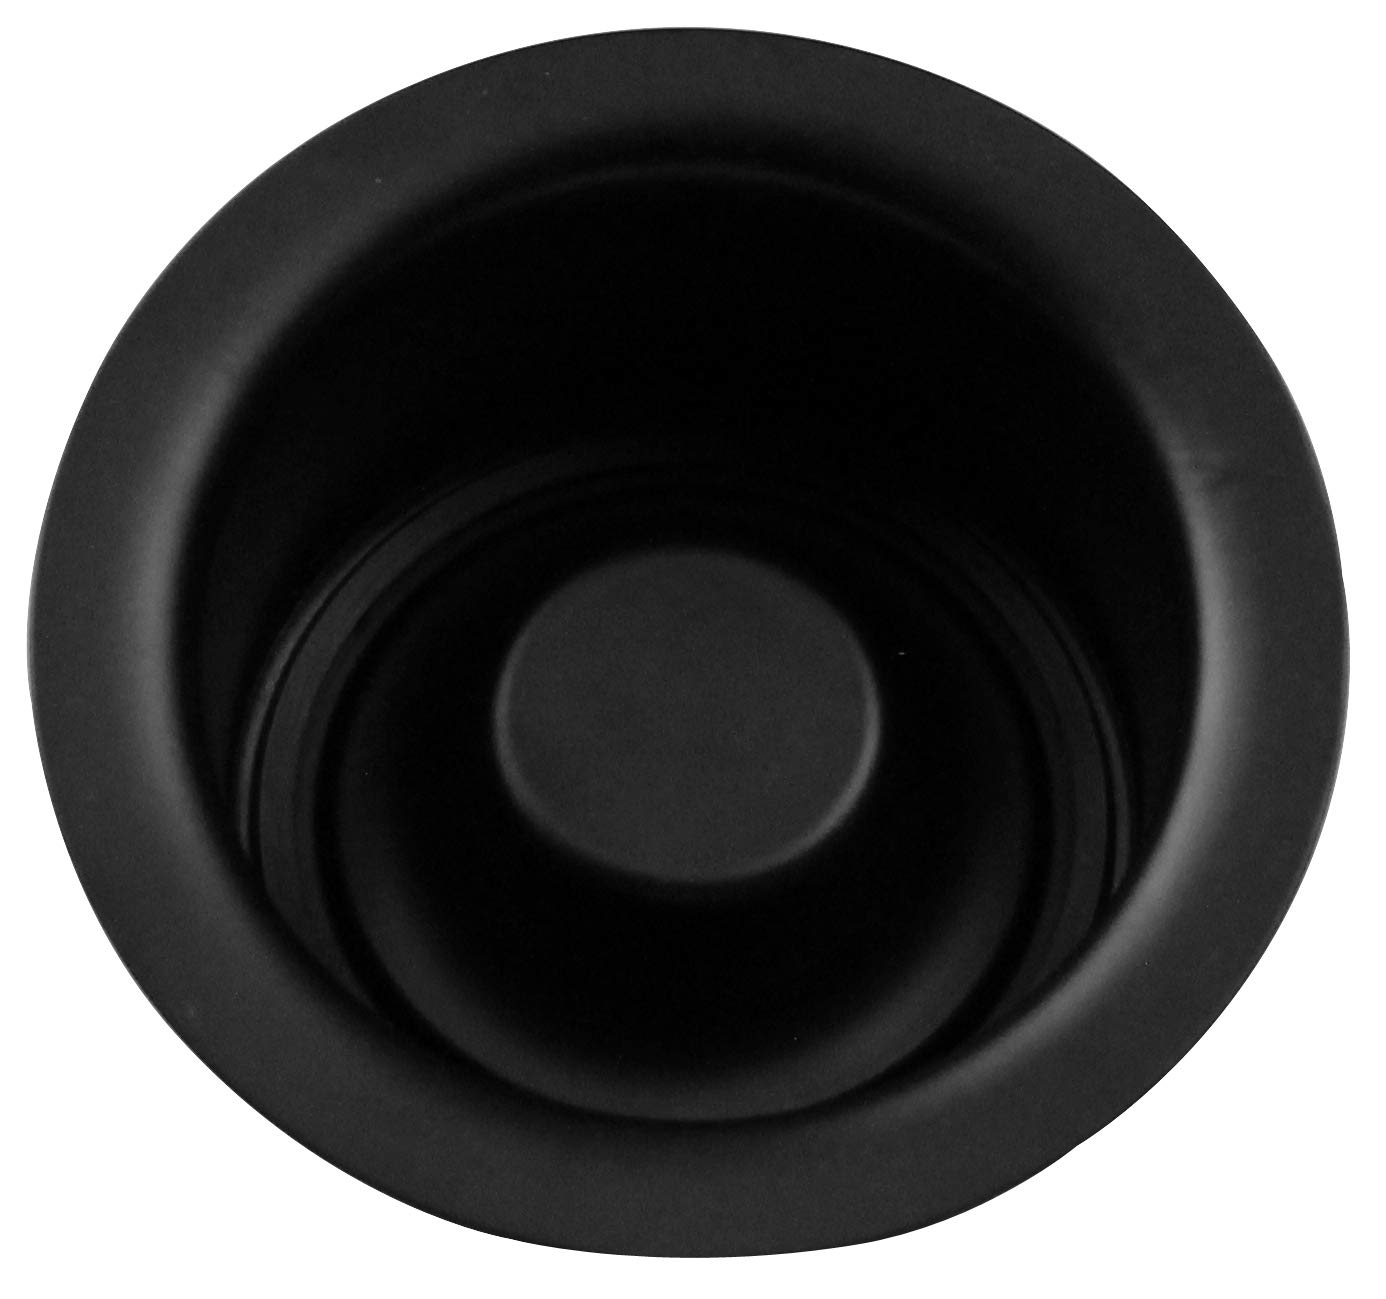 Westbrass InSinkErator Style Extra-Deep Disposal Flange & Stopper, Matte Black, D2082-62 by Westbrass